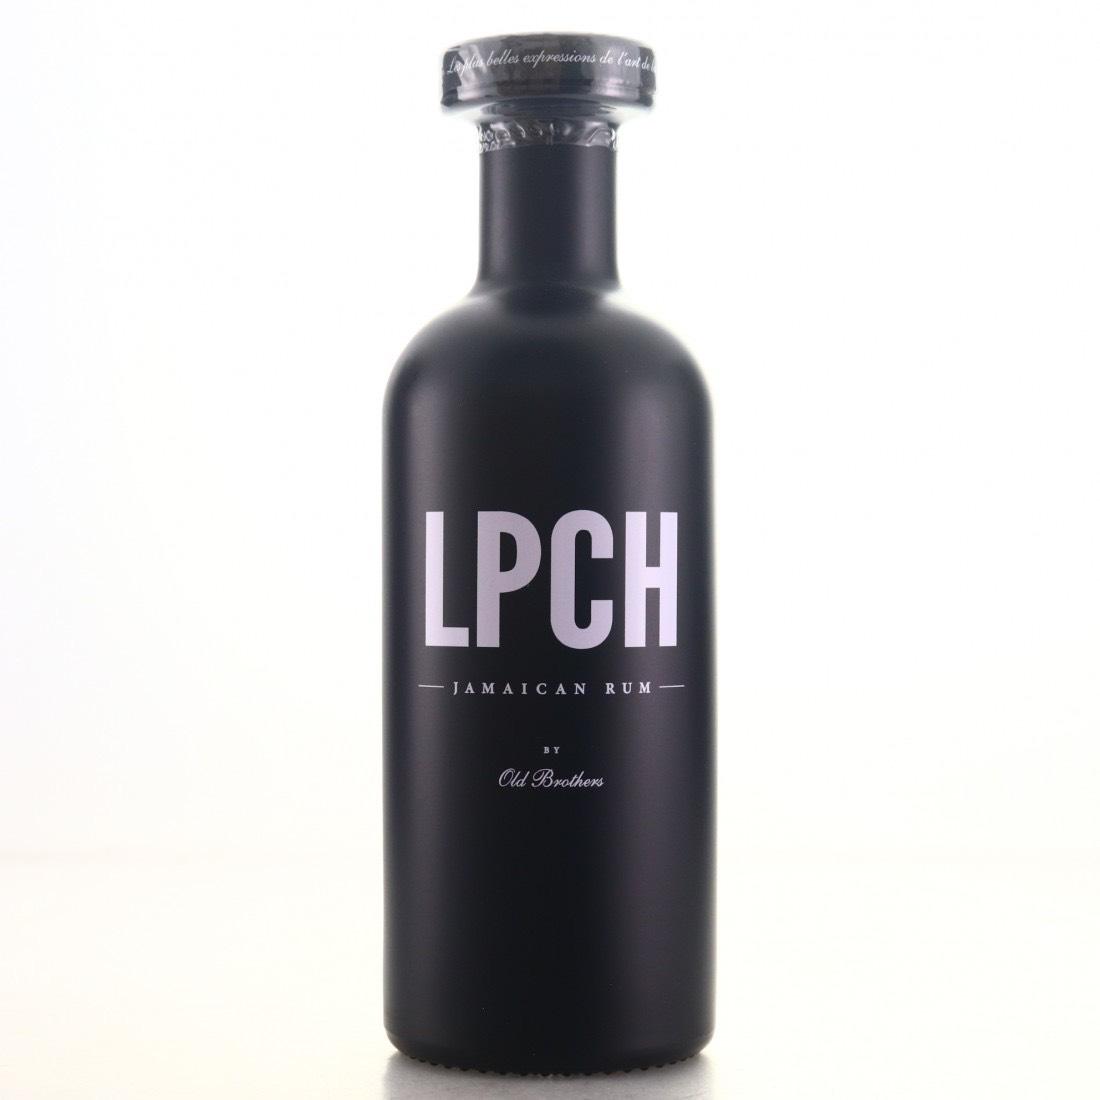 Bottle image of LPCH